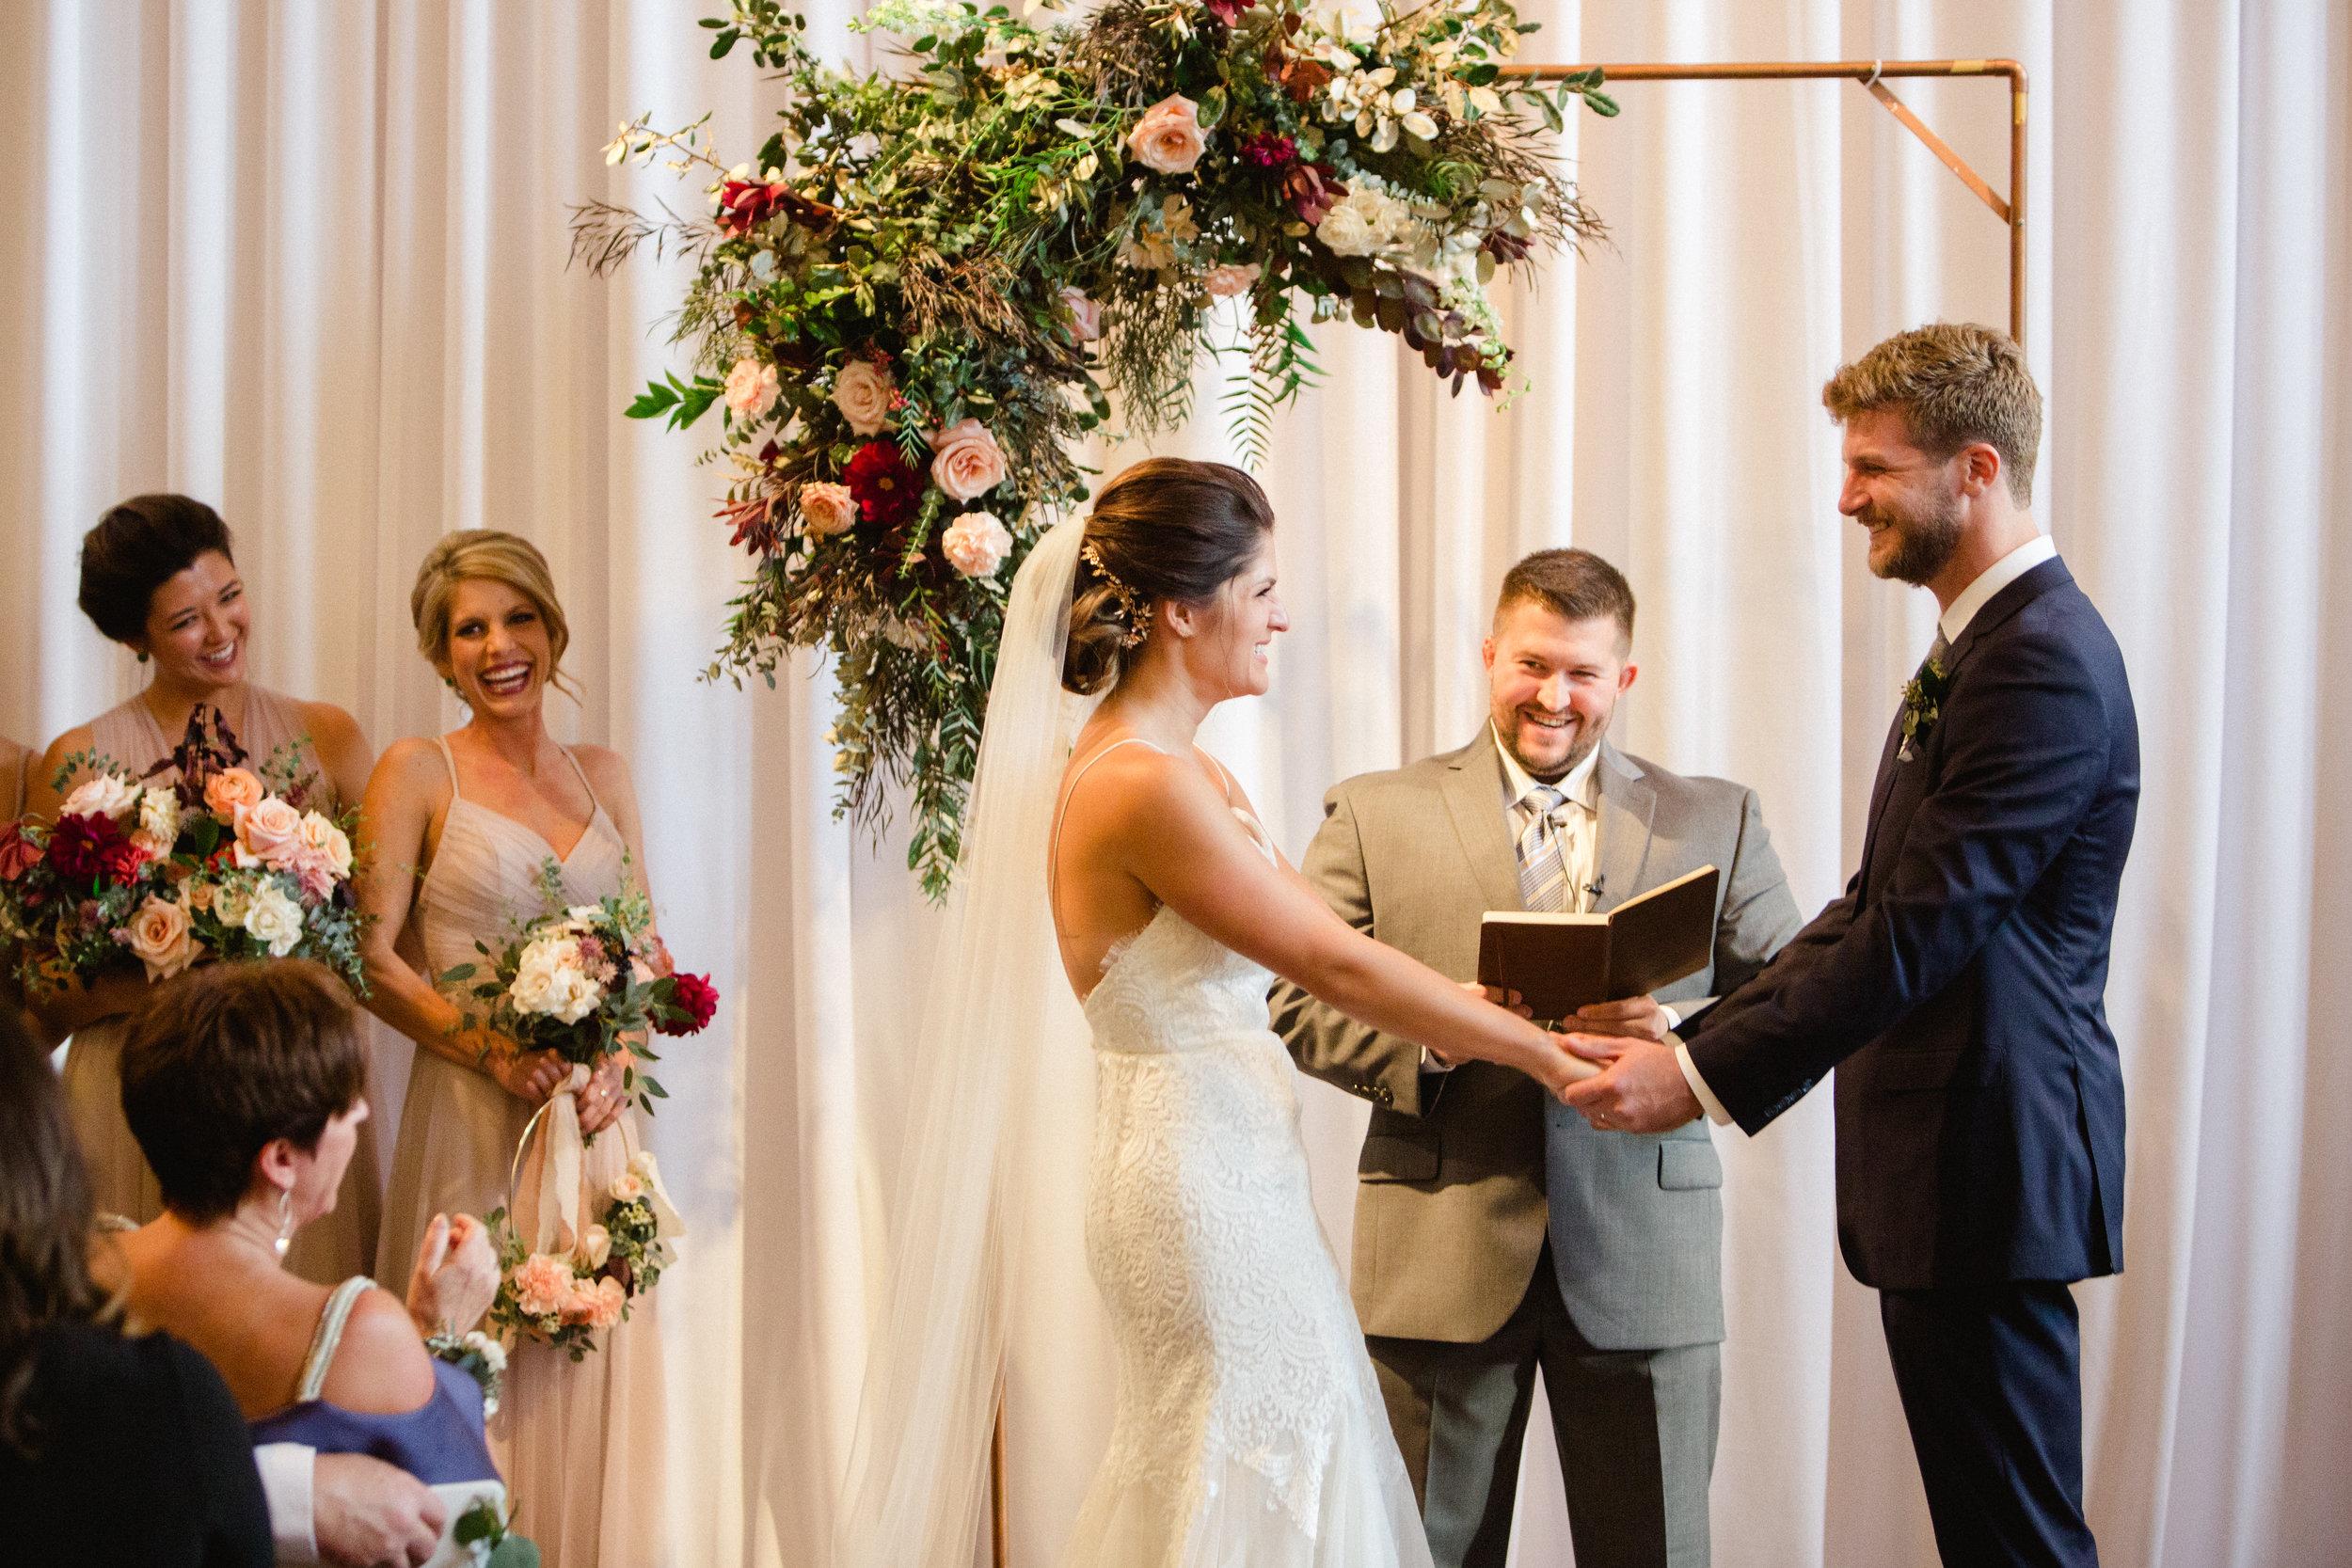 0726_ElizabethRyan_Wedding_AmyCampbellPhotography.jpg